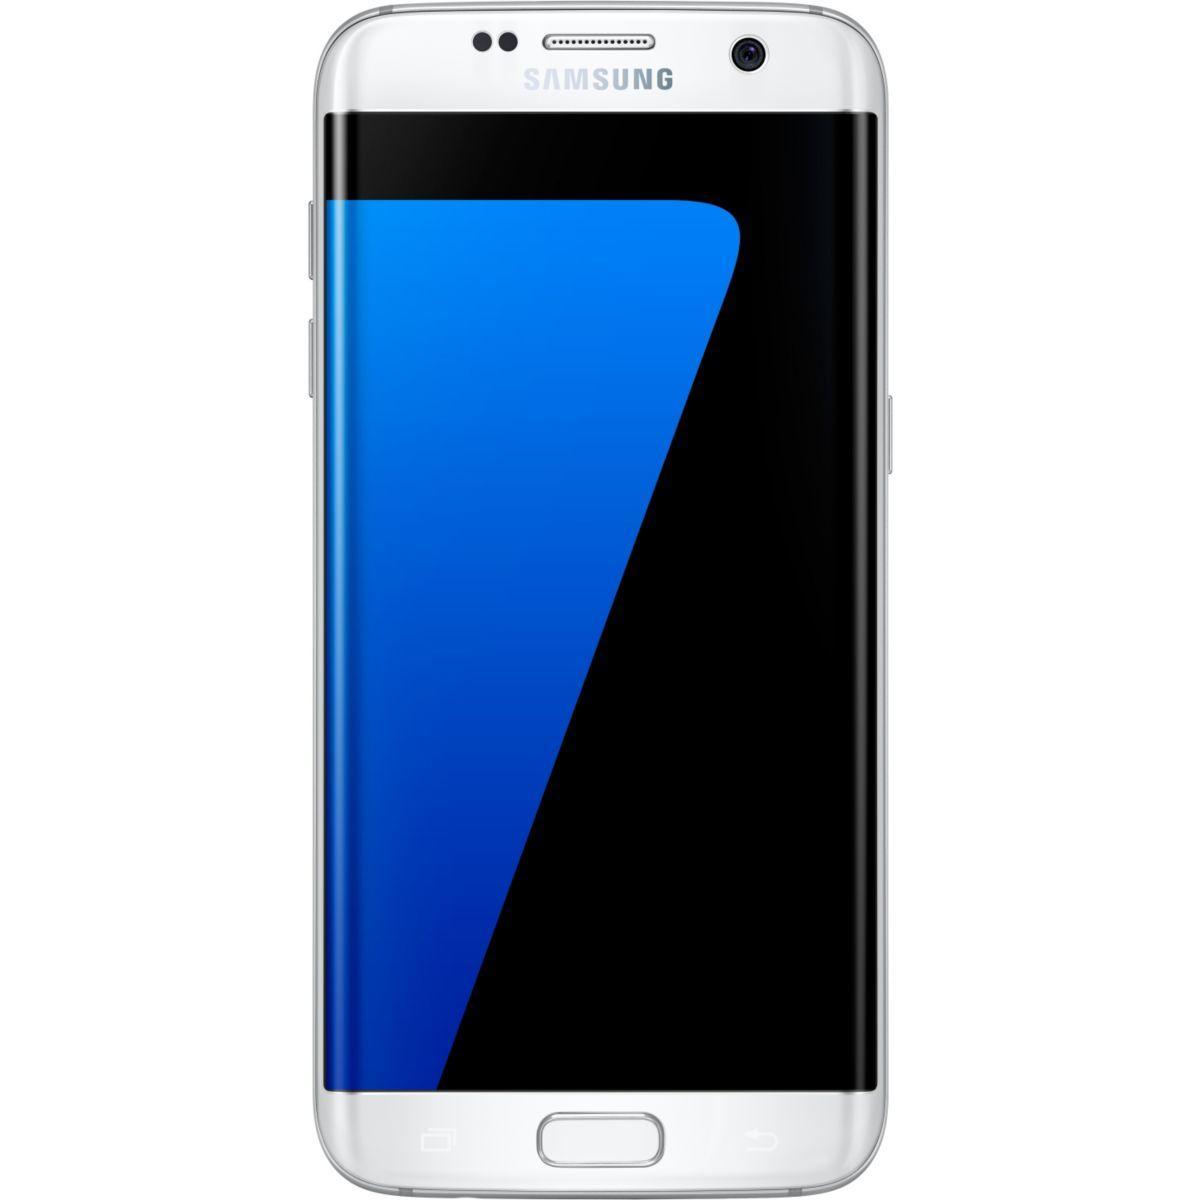 Pack promo smartphone samsung galaxy s7 edge 32go blanc + carte mémoire micro sd samsung 128go evo plus classe 10 + adaptateur - soldes et bonnes affa